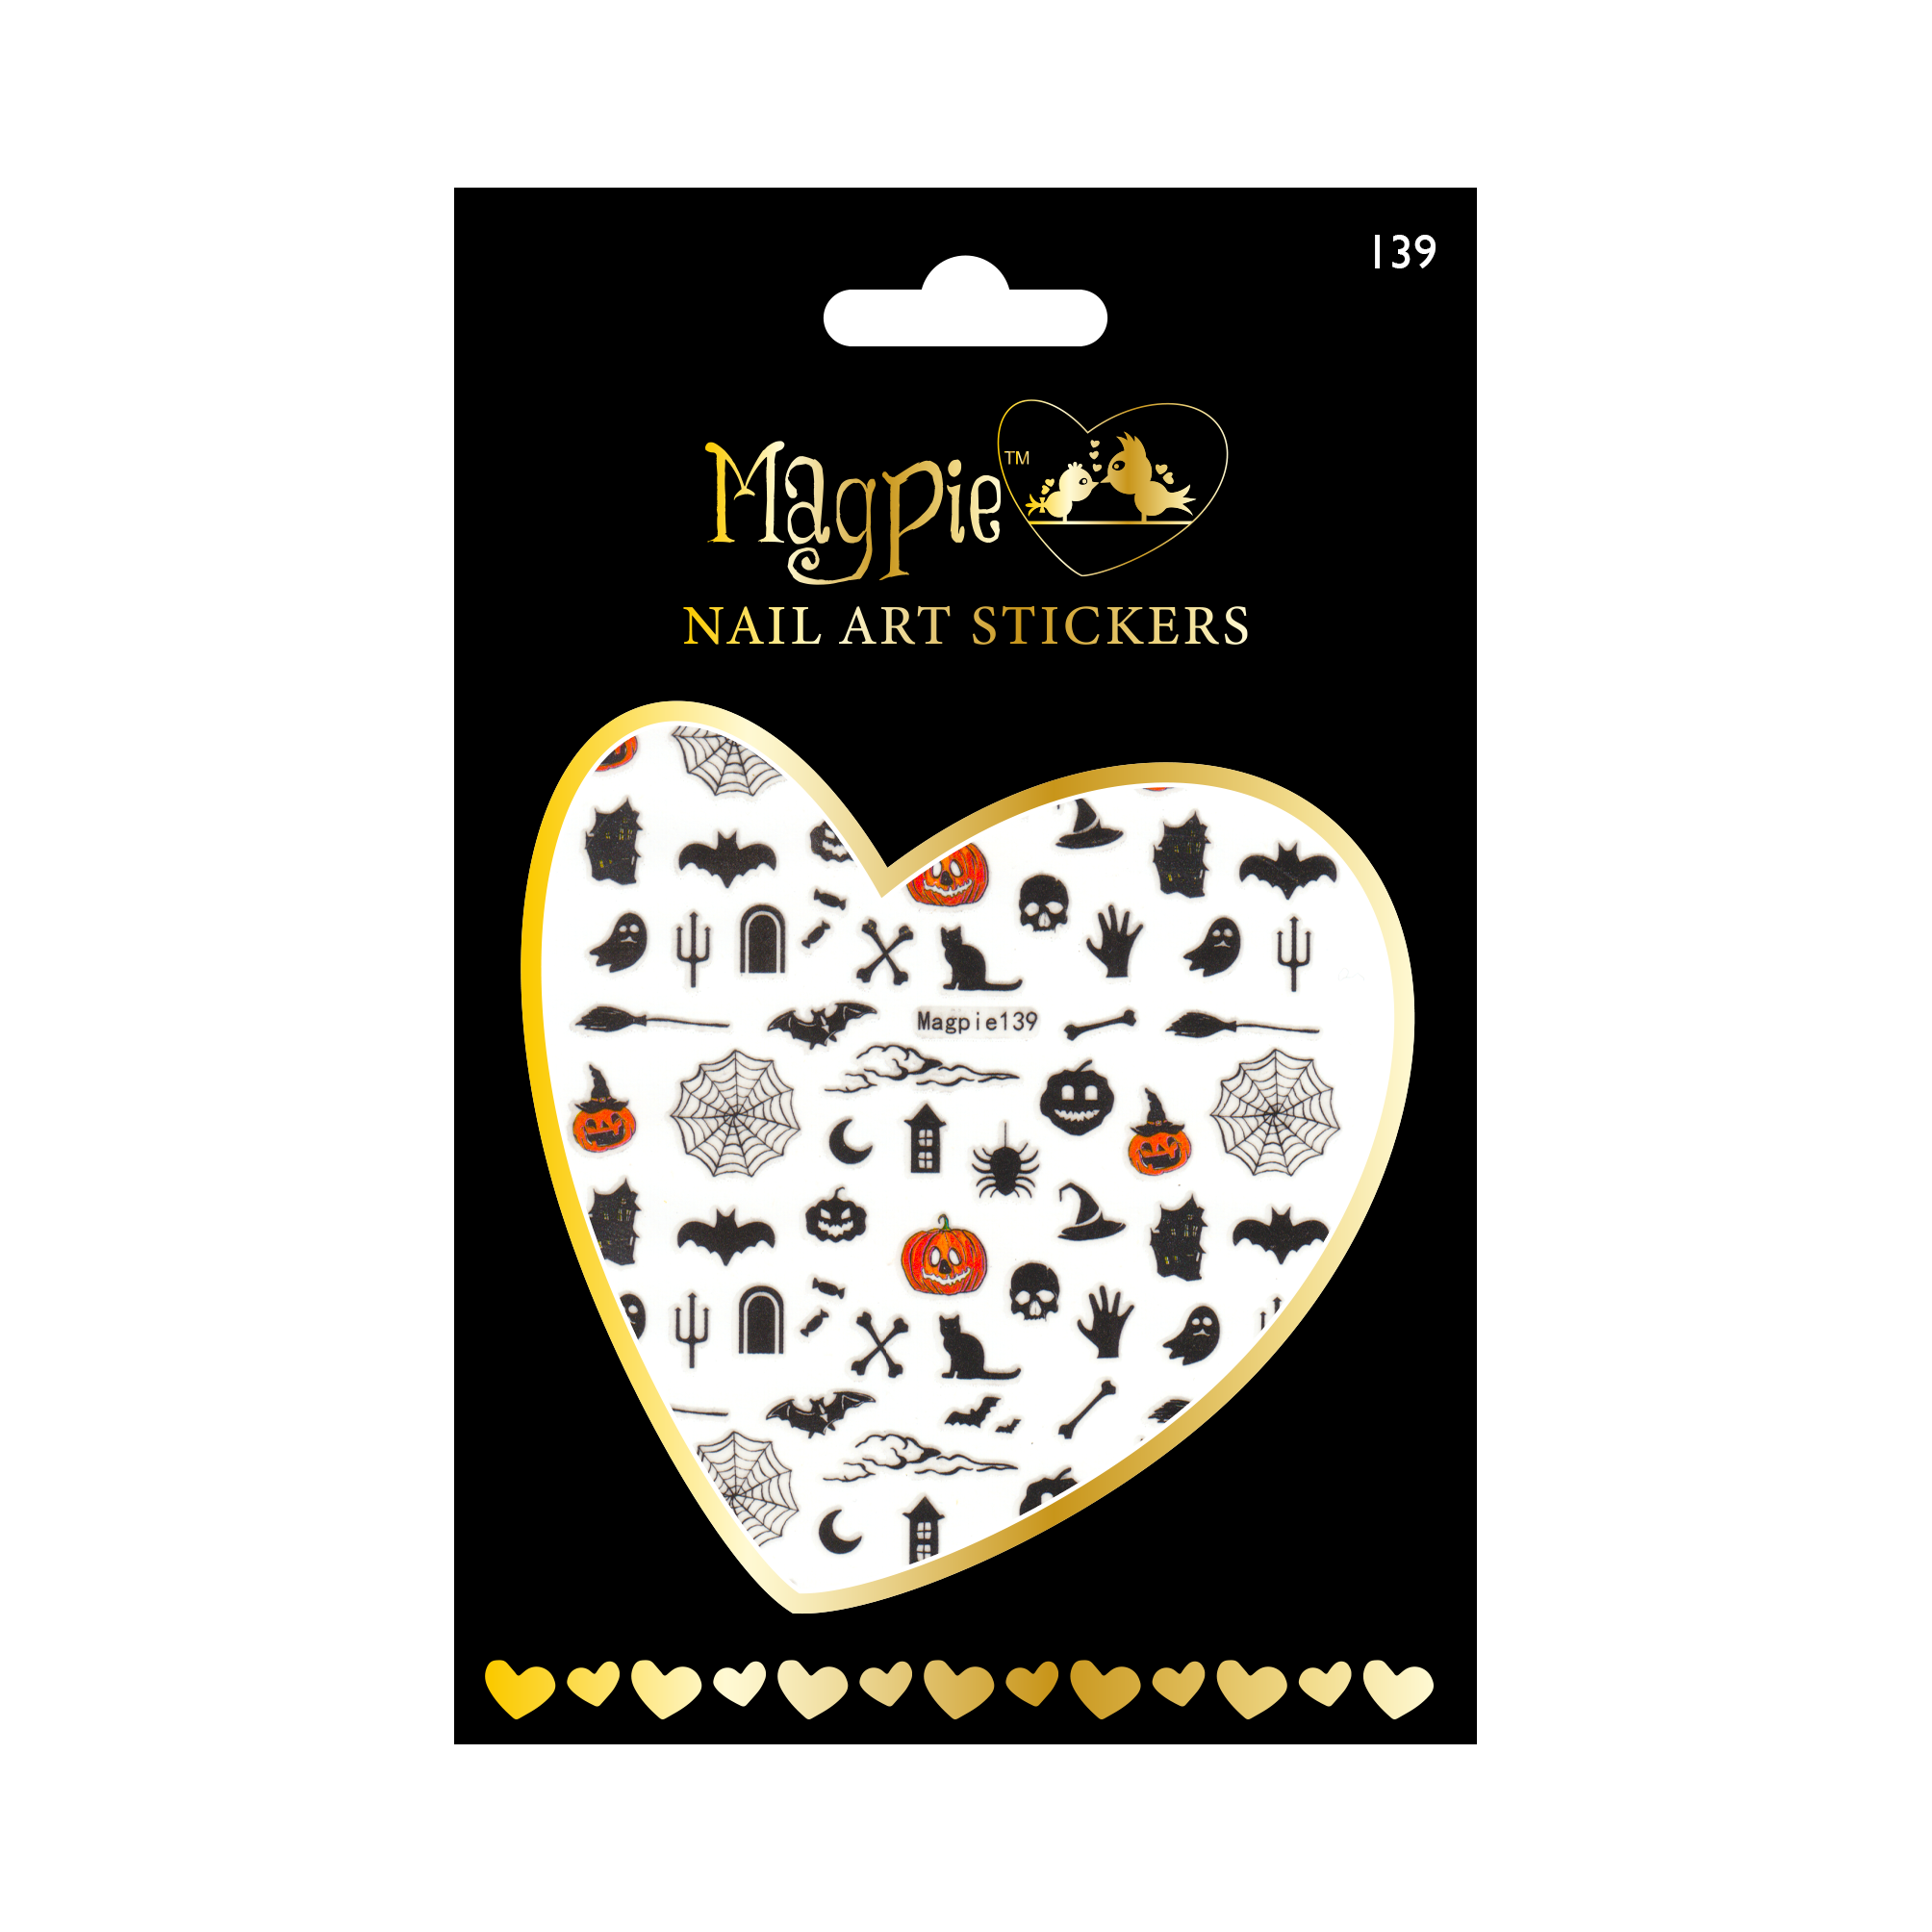 Magpie 139 stickers